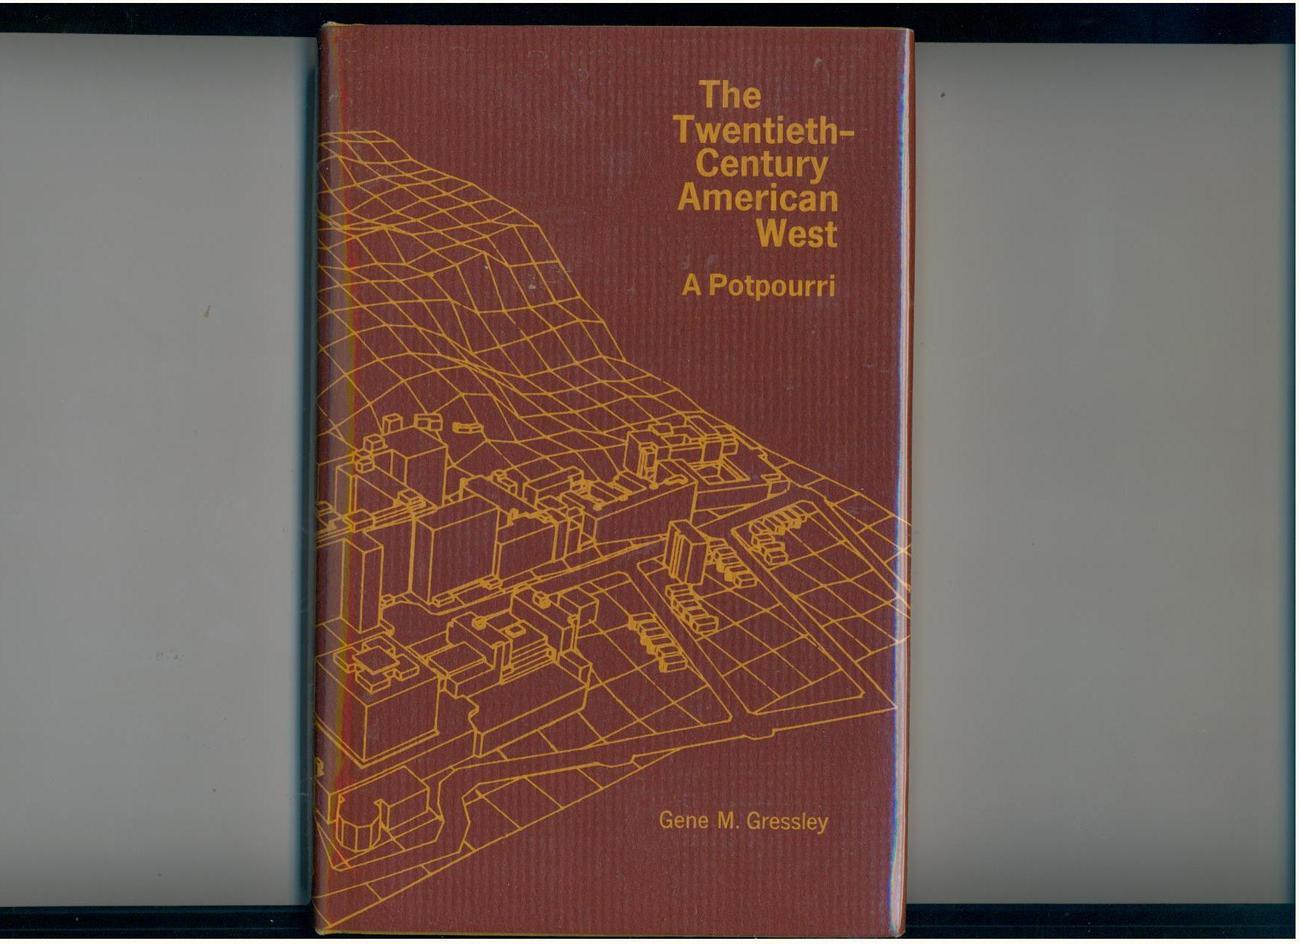 20TH CENTURY AMERICAN WEST - 1977